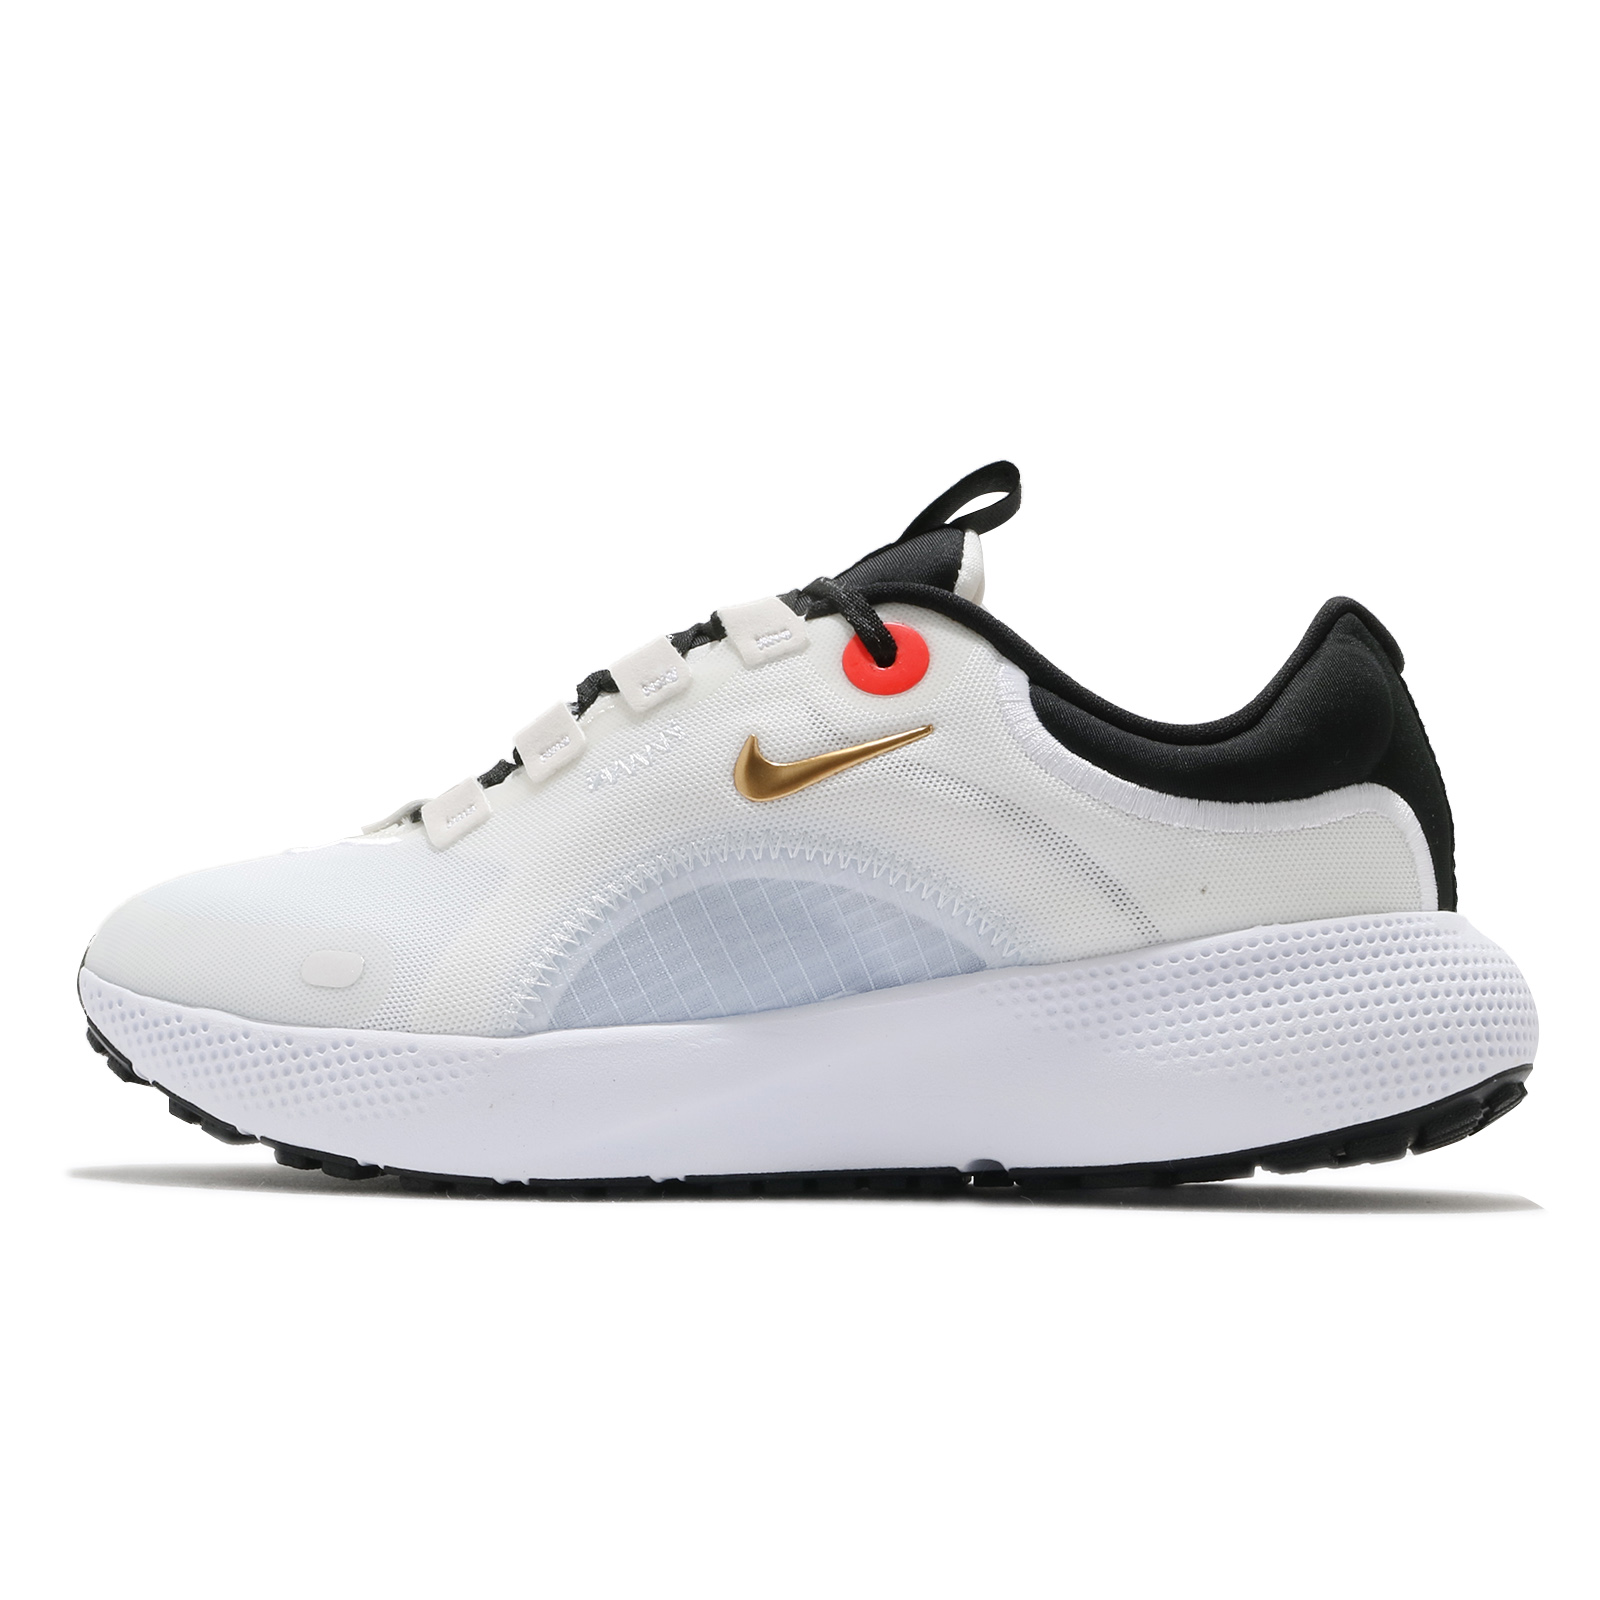 Nike 慢跑鞋 Wmns React Escape RN 白 金 紅 女鞋 運動鞋 【ACS】 CV3817-103